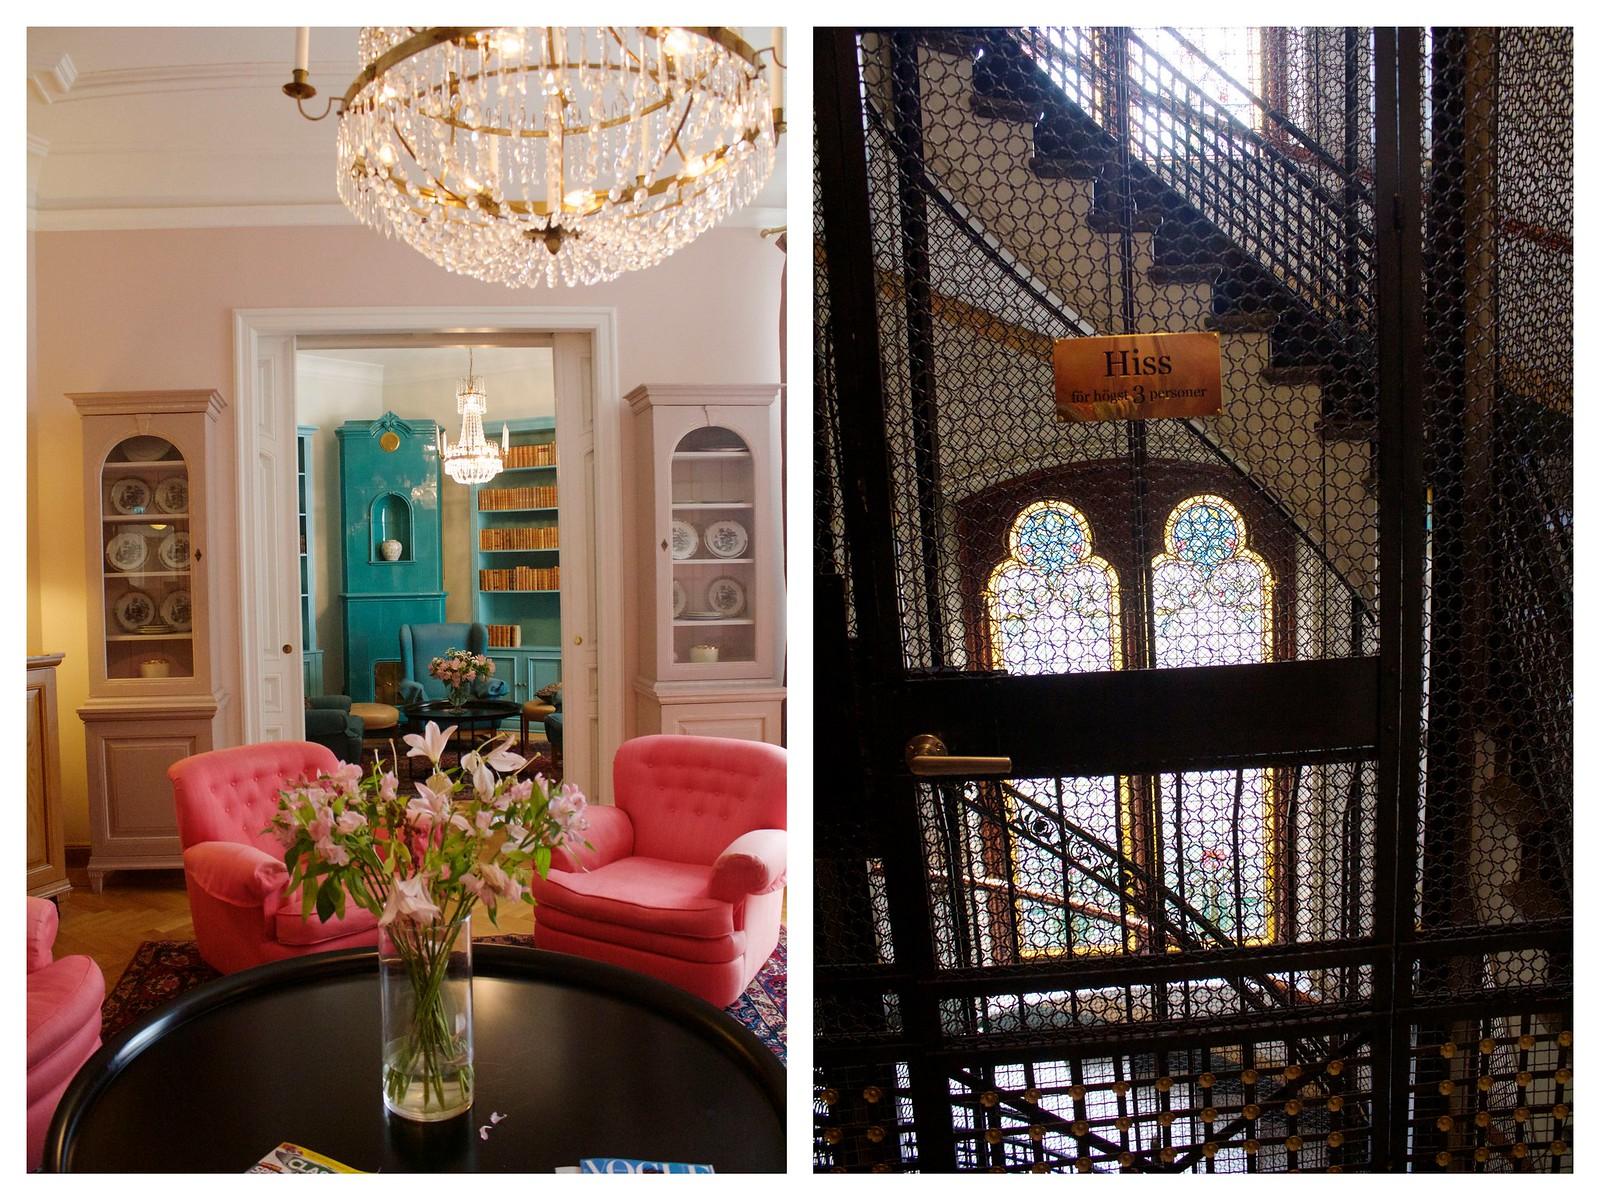 Hotell Drottning Kristina Stockholm